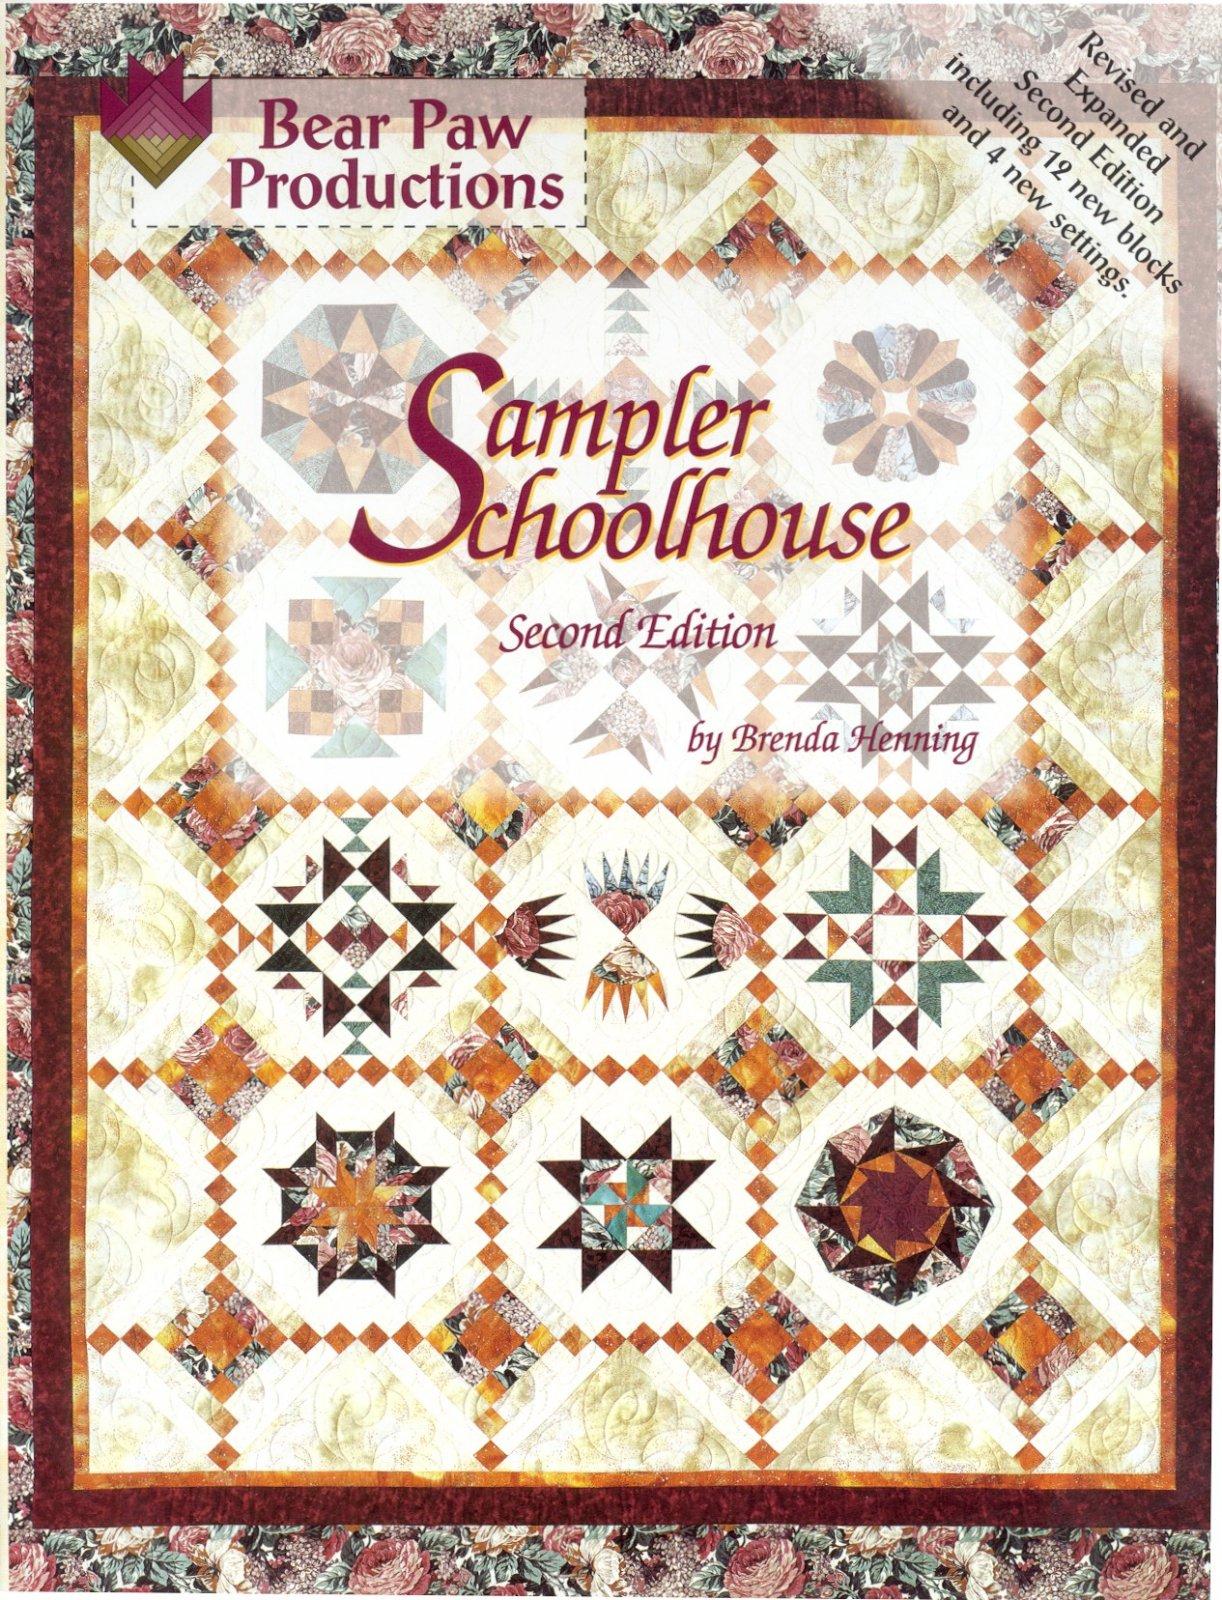 Sampler Schoolhouse 2nd Edition